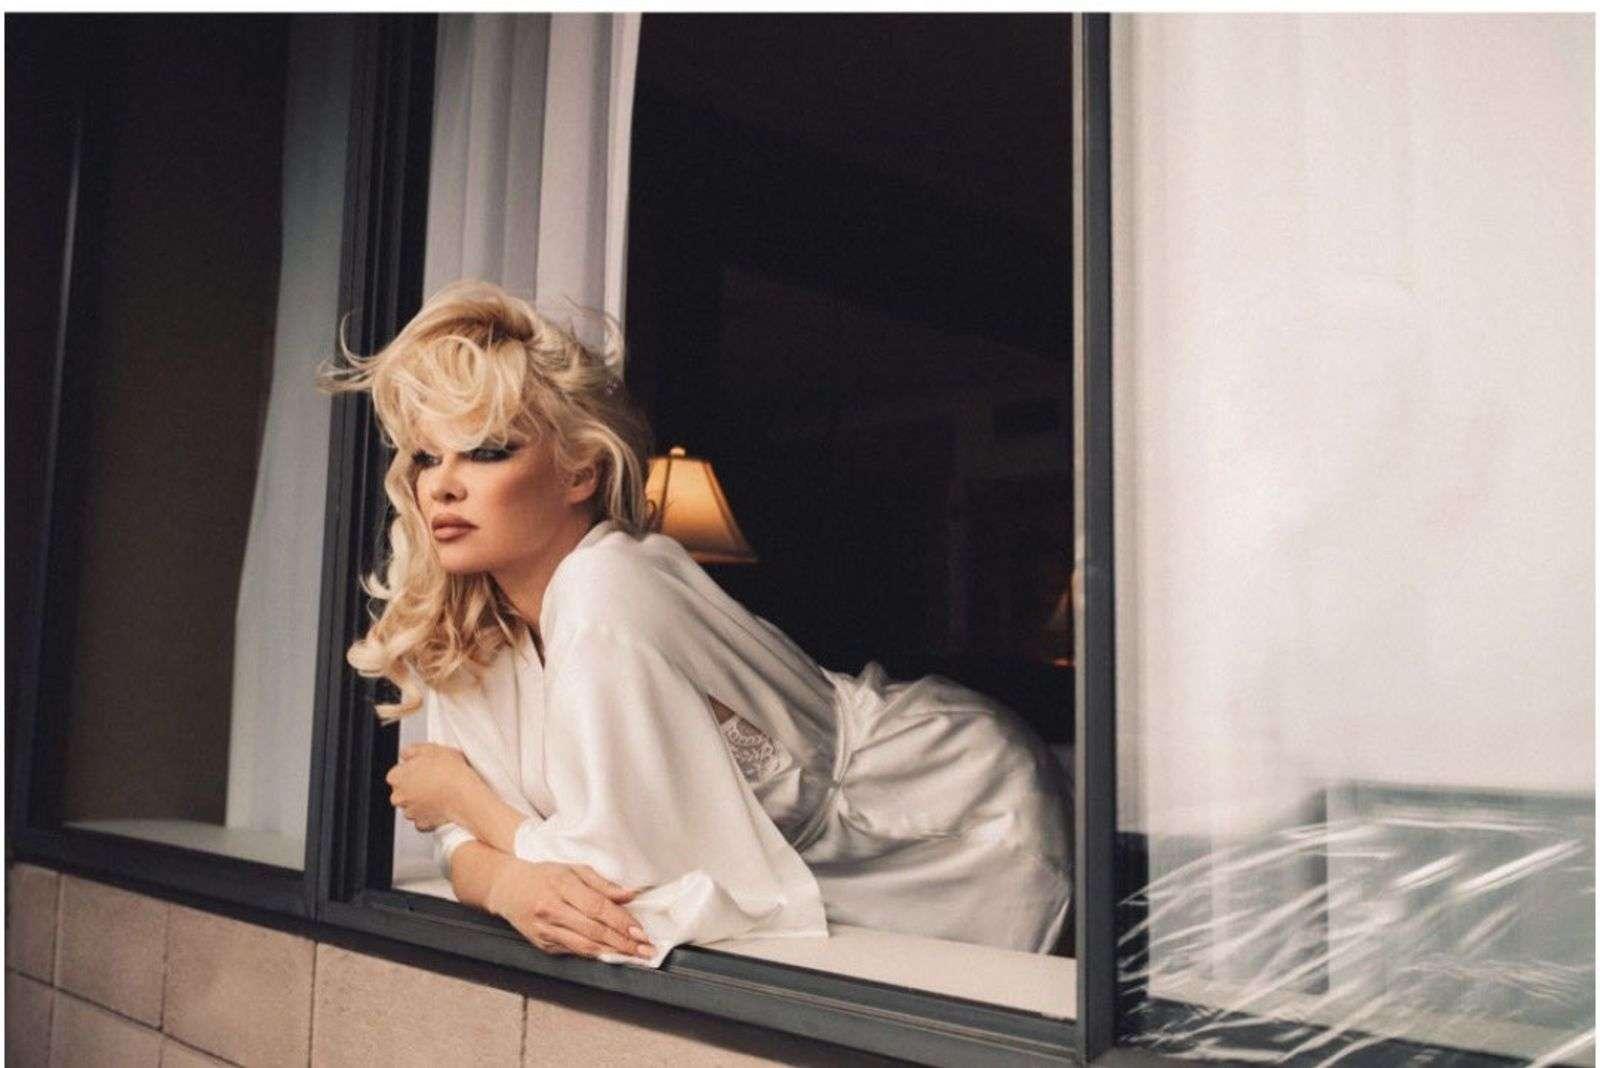 Pamela Anderson Karolina Turek Photoshoot Images and Photos HD